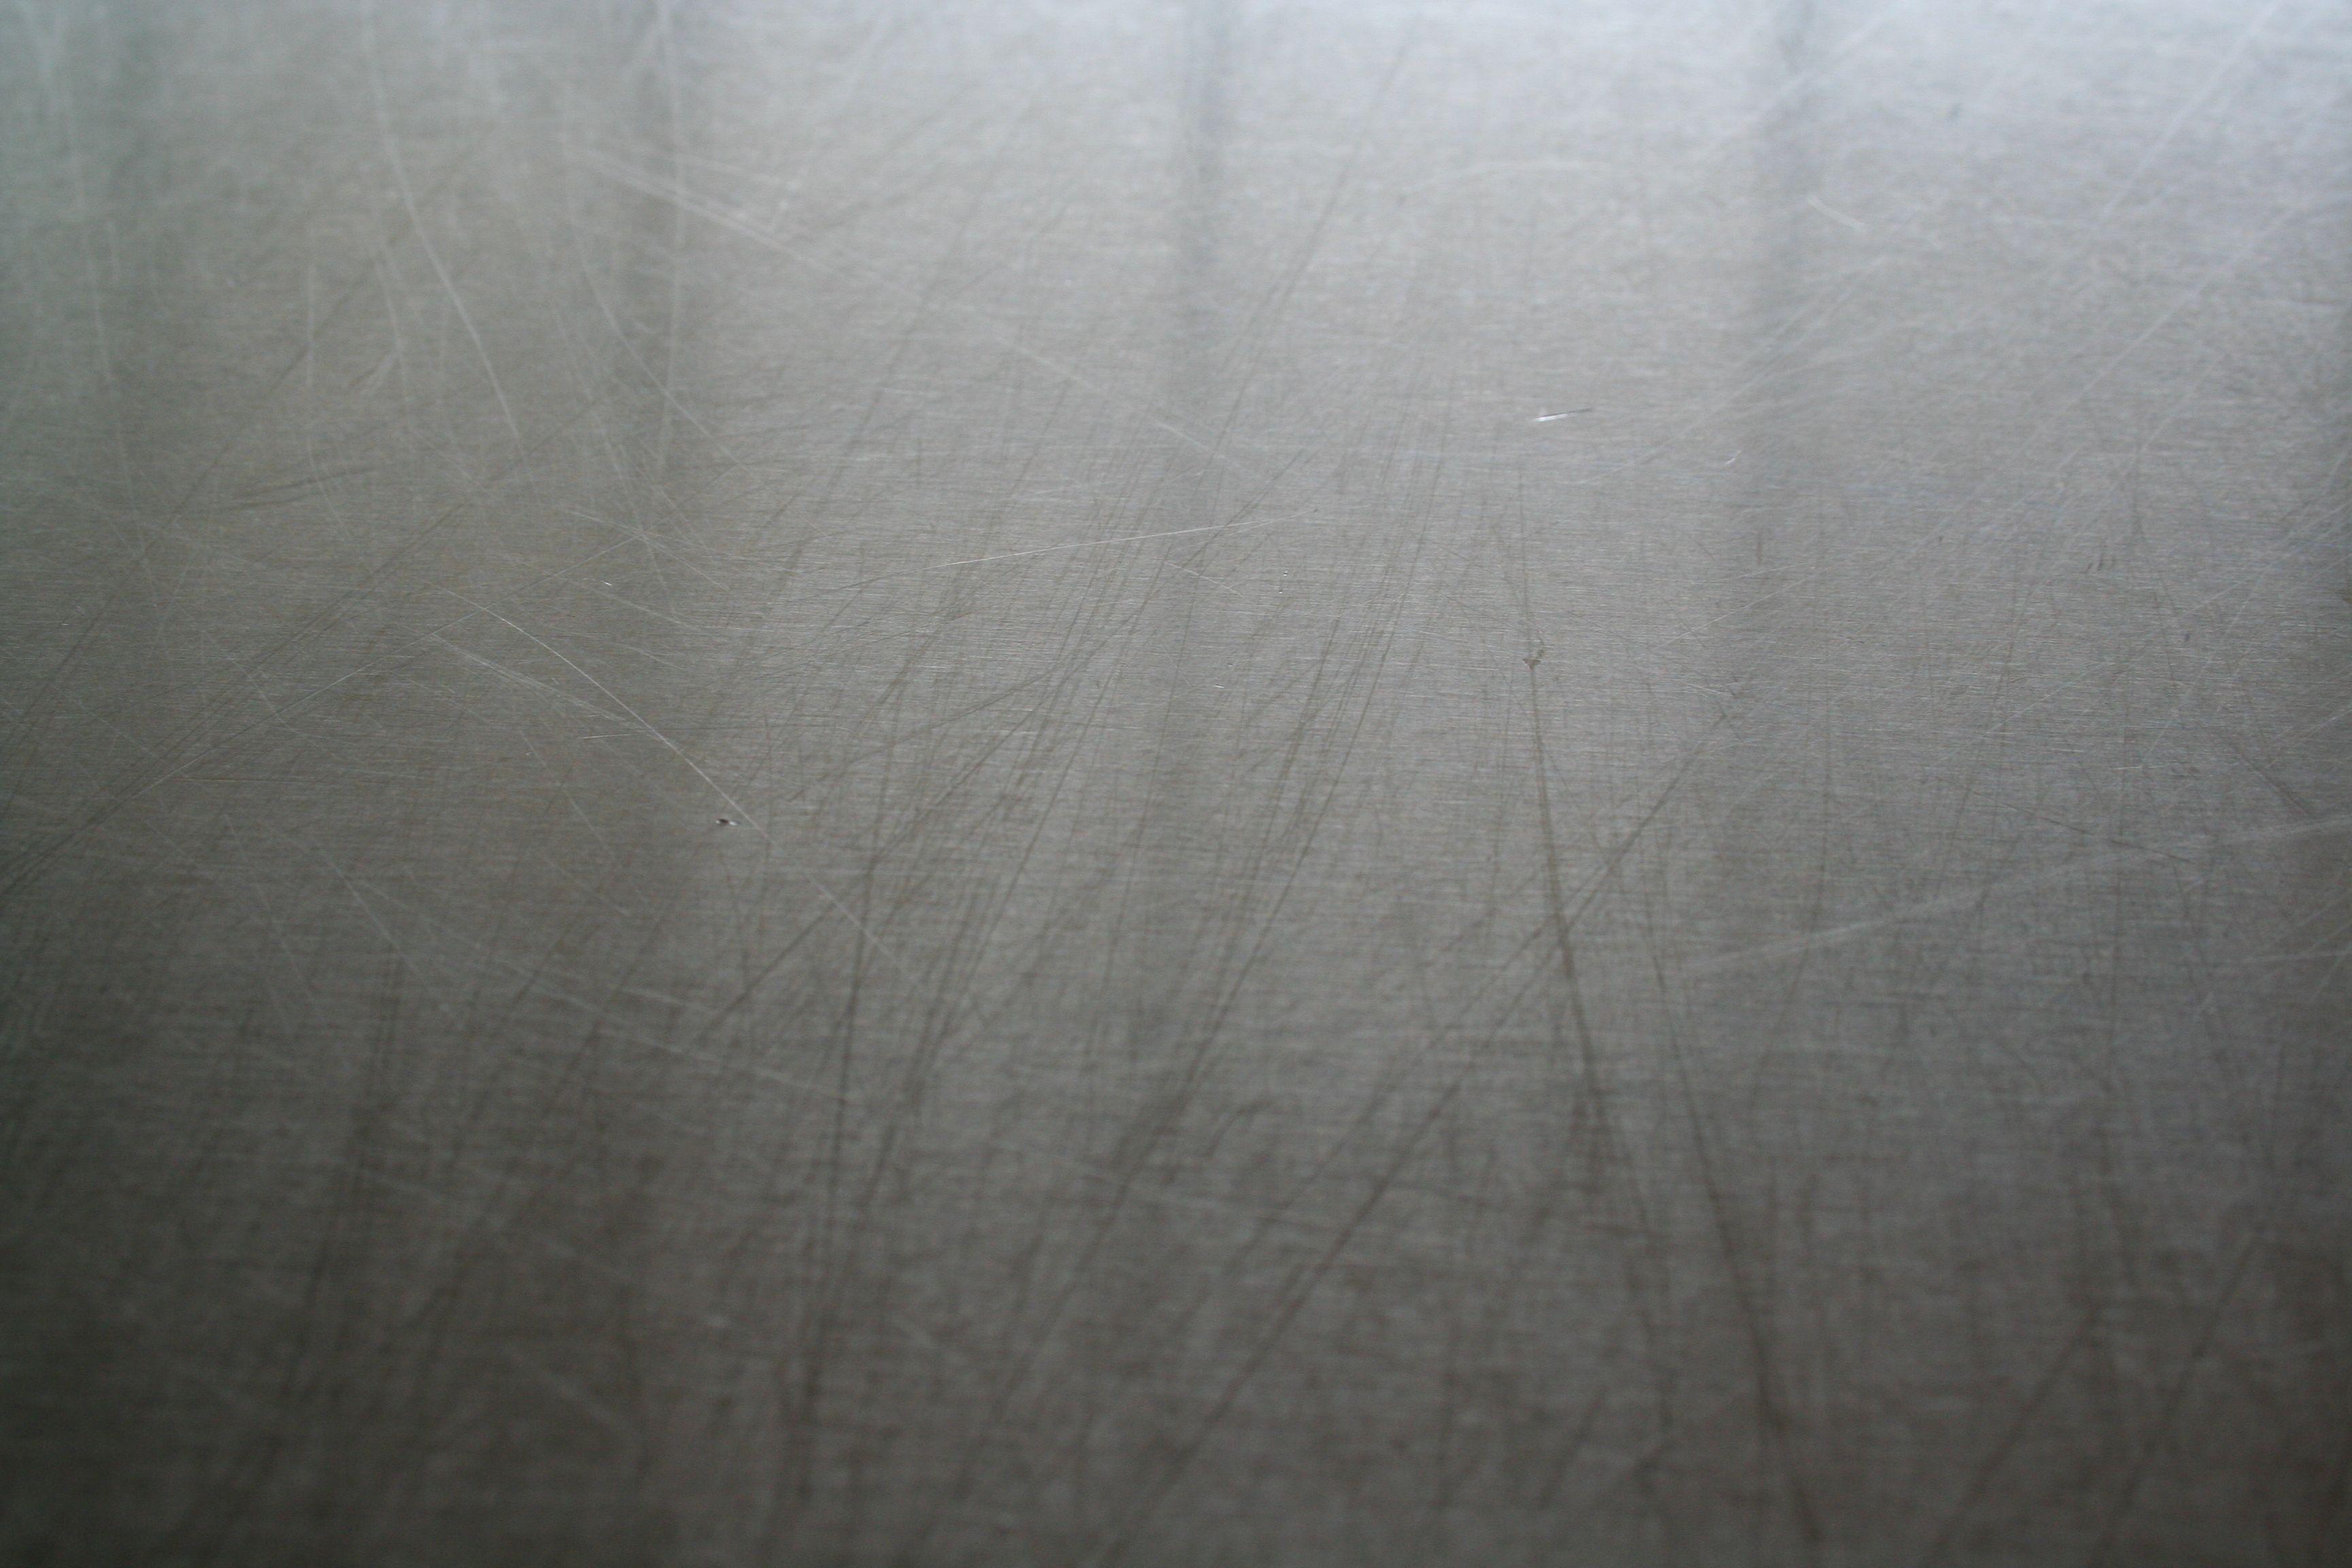 metal wall texture. Brushed Steel Metallic Texture By FantasyStock.deviantart.com On @deviantART   3D Textures Pinterest And Metal Wall